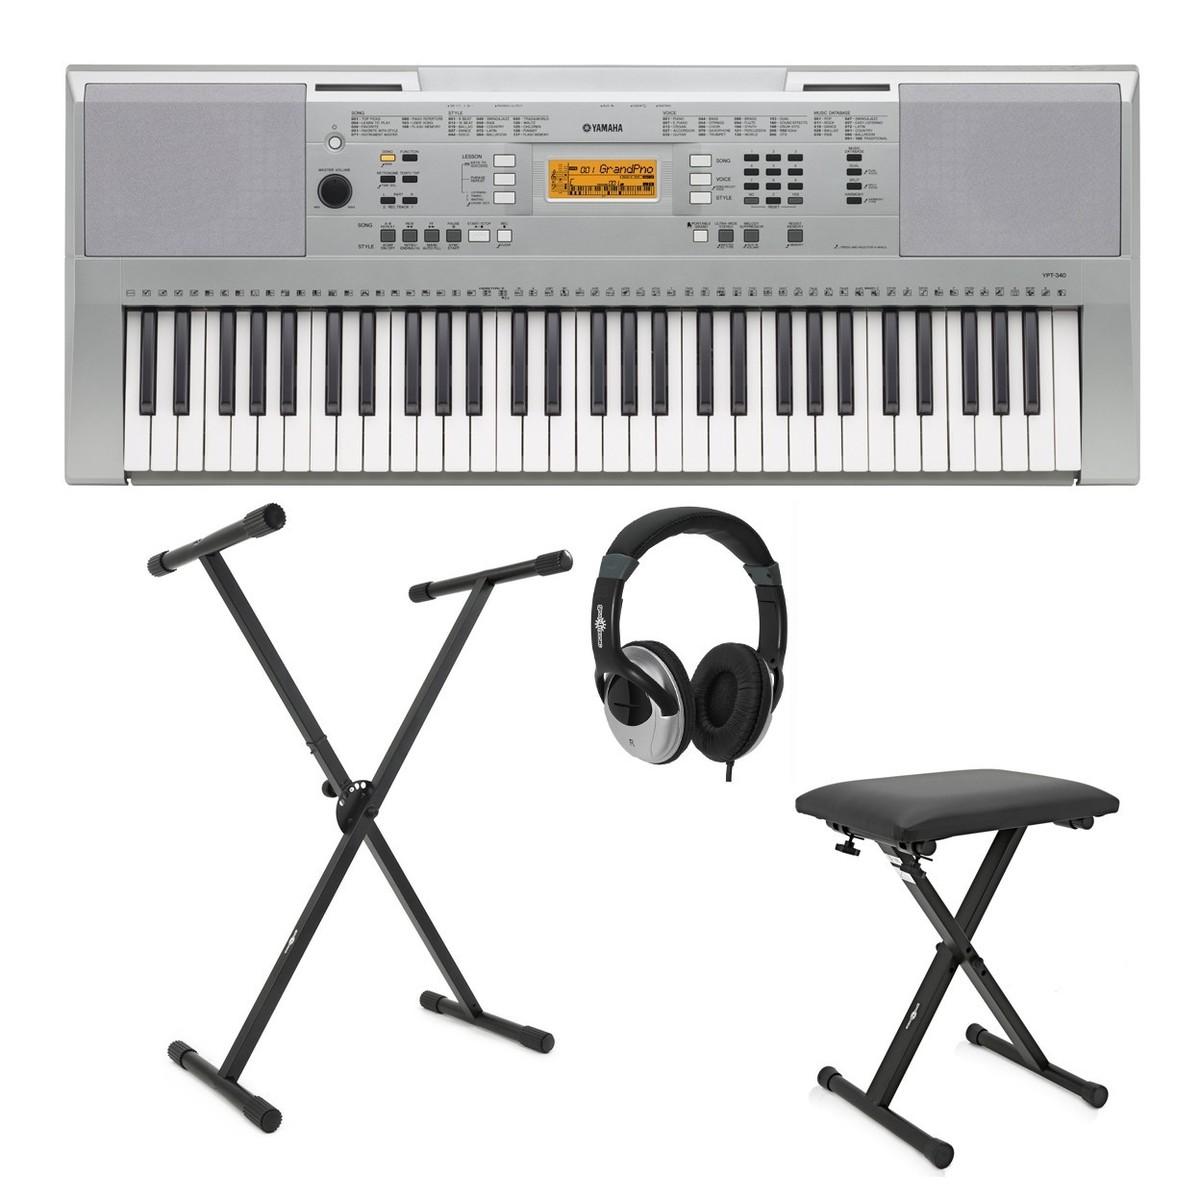 Yamaha Ypt 340 Portable Keyboard Package At Gear4music